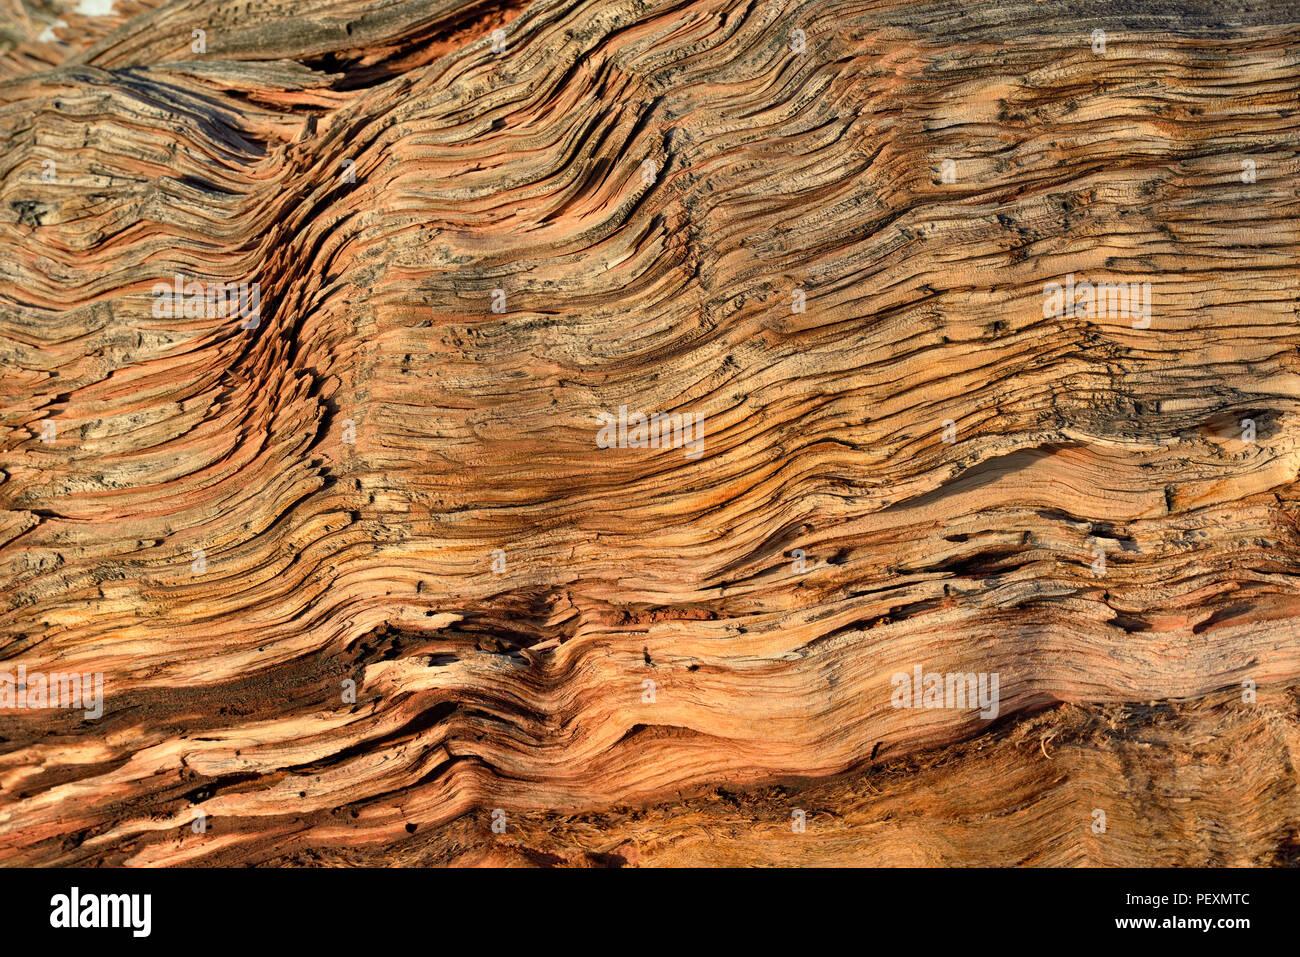 Juniper wood, Dead Horse Point State Park, Utah, USA - Stock Image